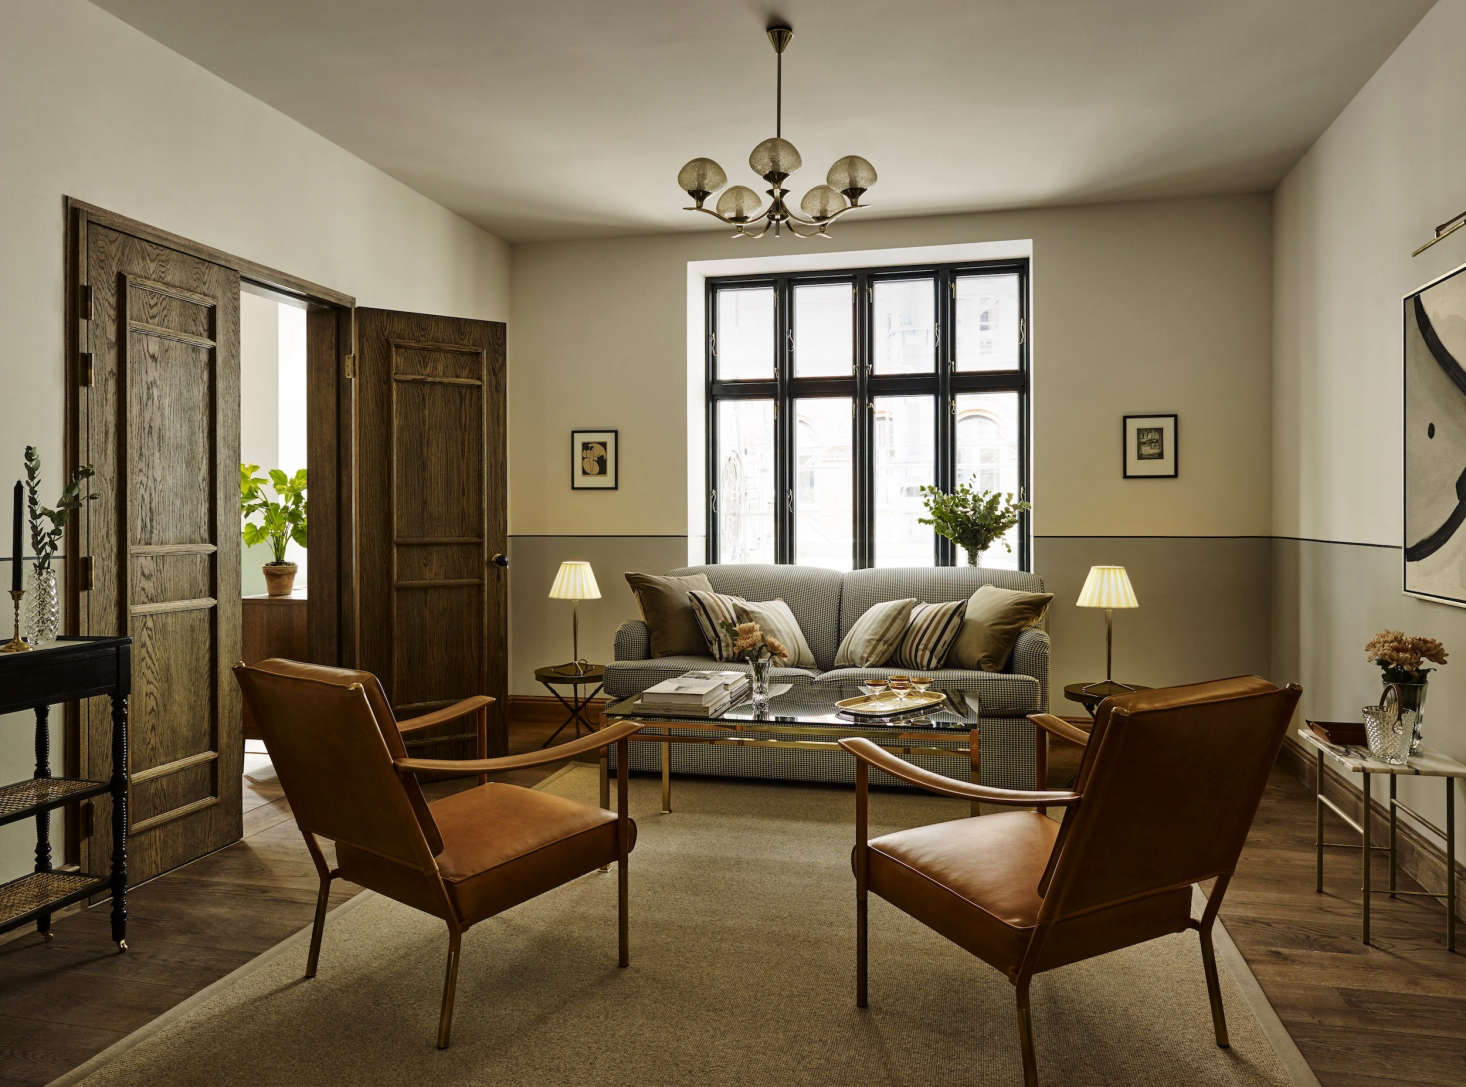 An adjacent sitting room.